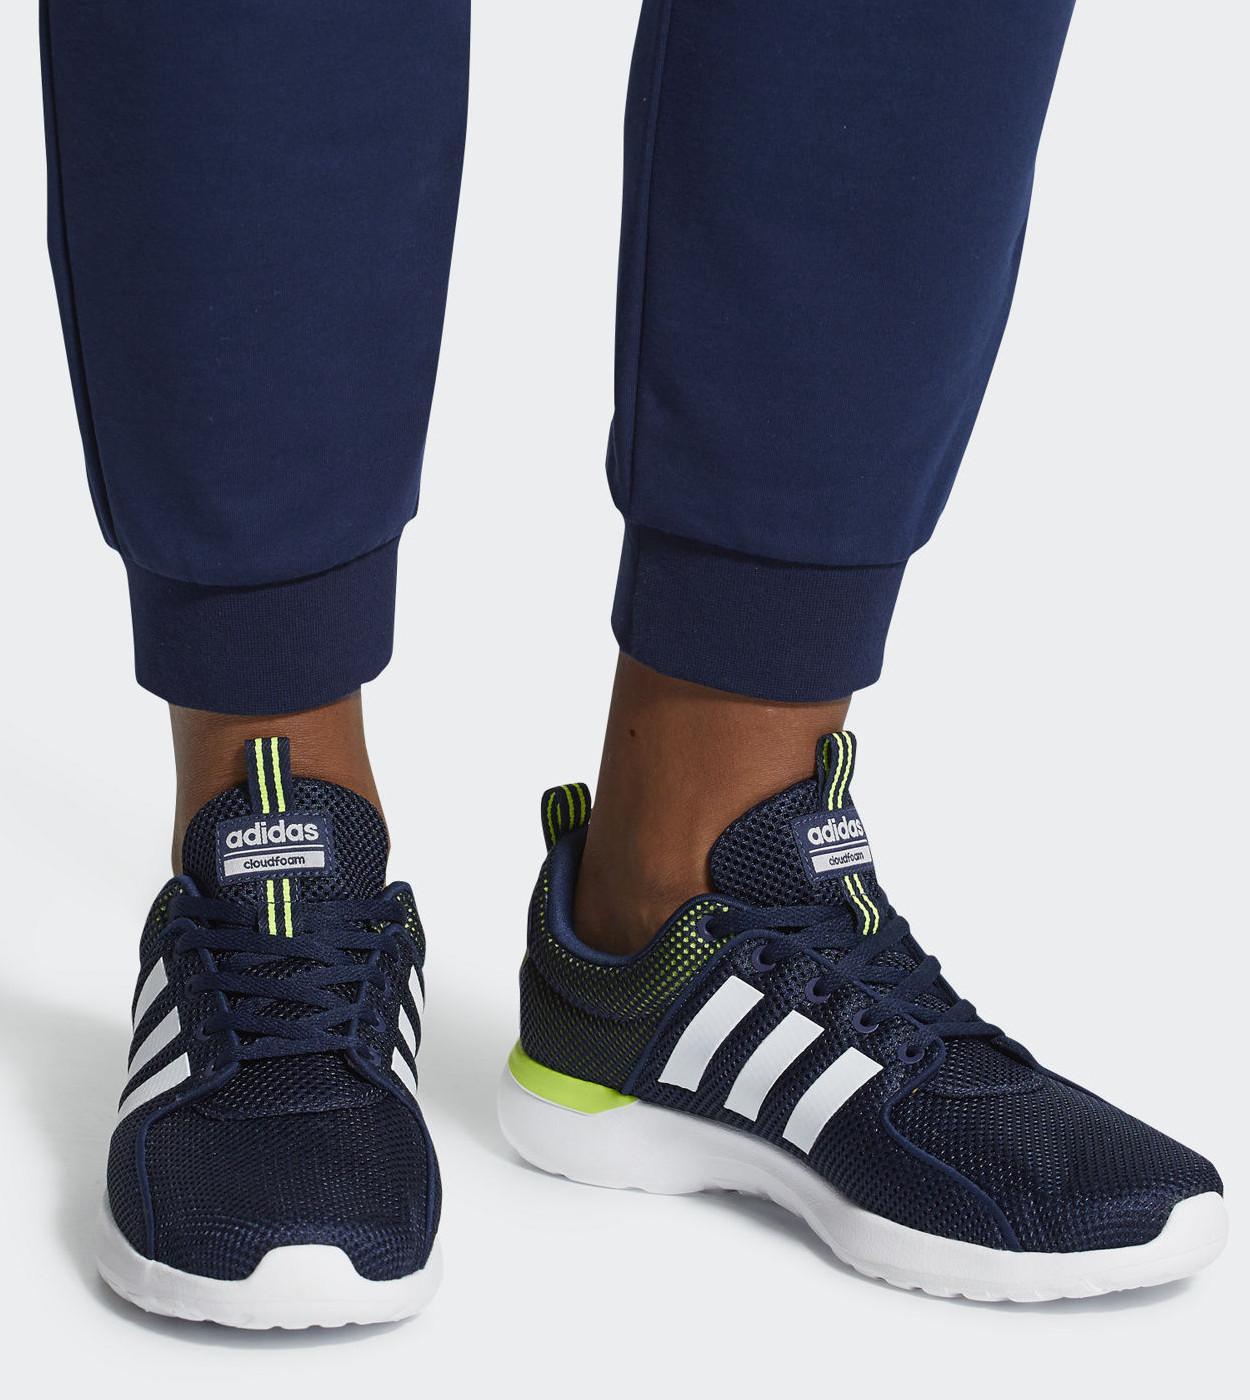 Adidas Scarpe Sneakers Trainers Sportive Ginnastica Tennis CF Lite Racer Uomo